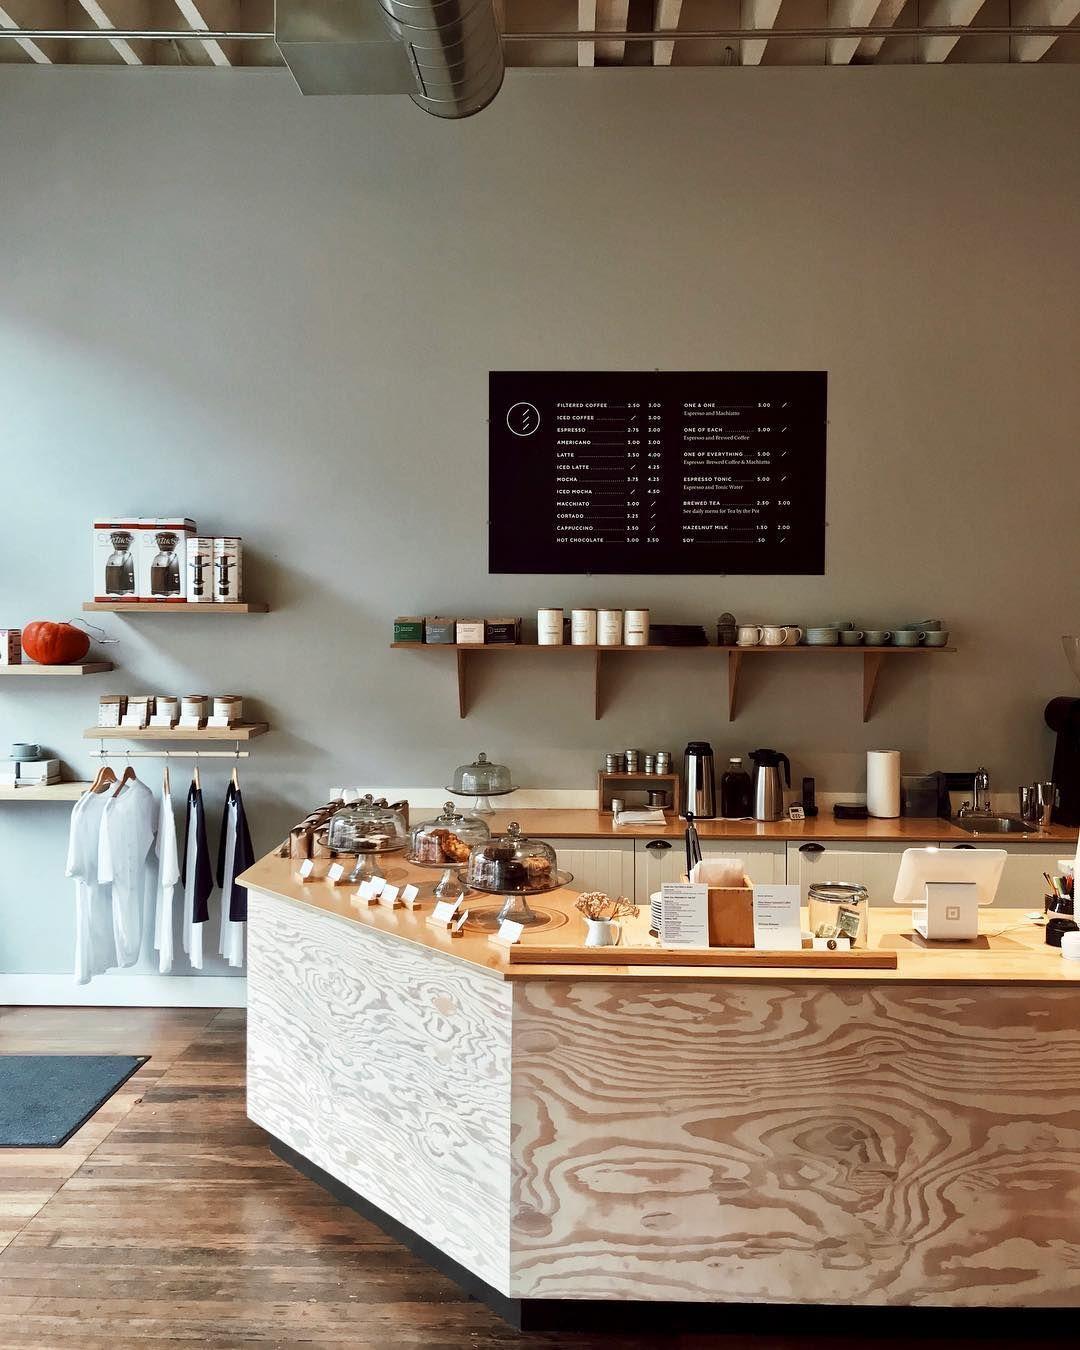 elm coffee roasters photo mressentialist on instagram cafe coffeeshop